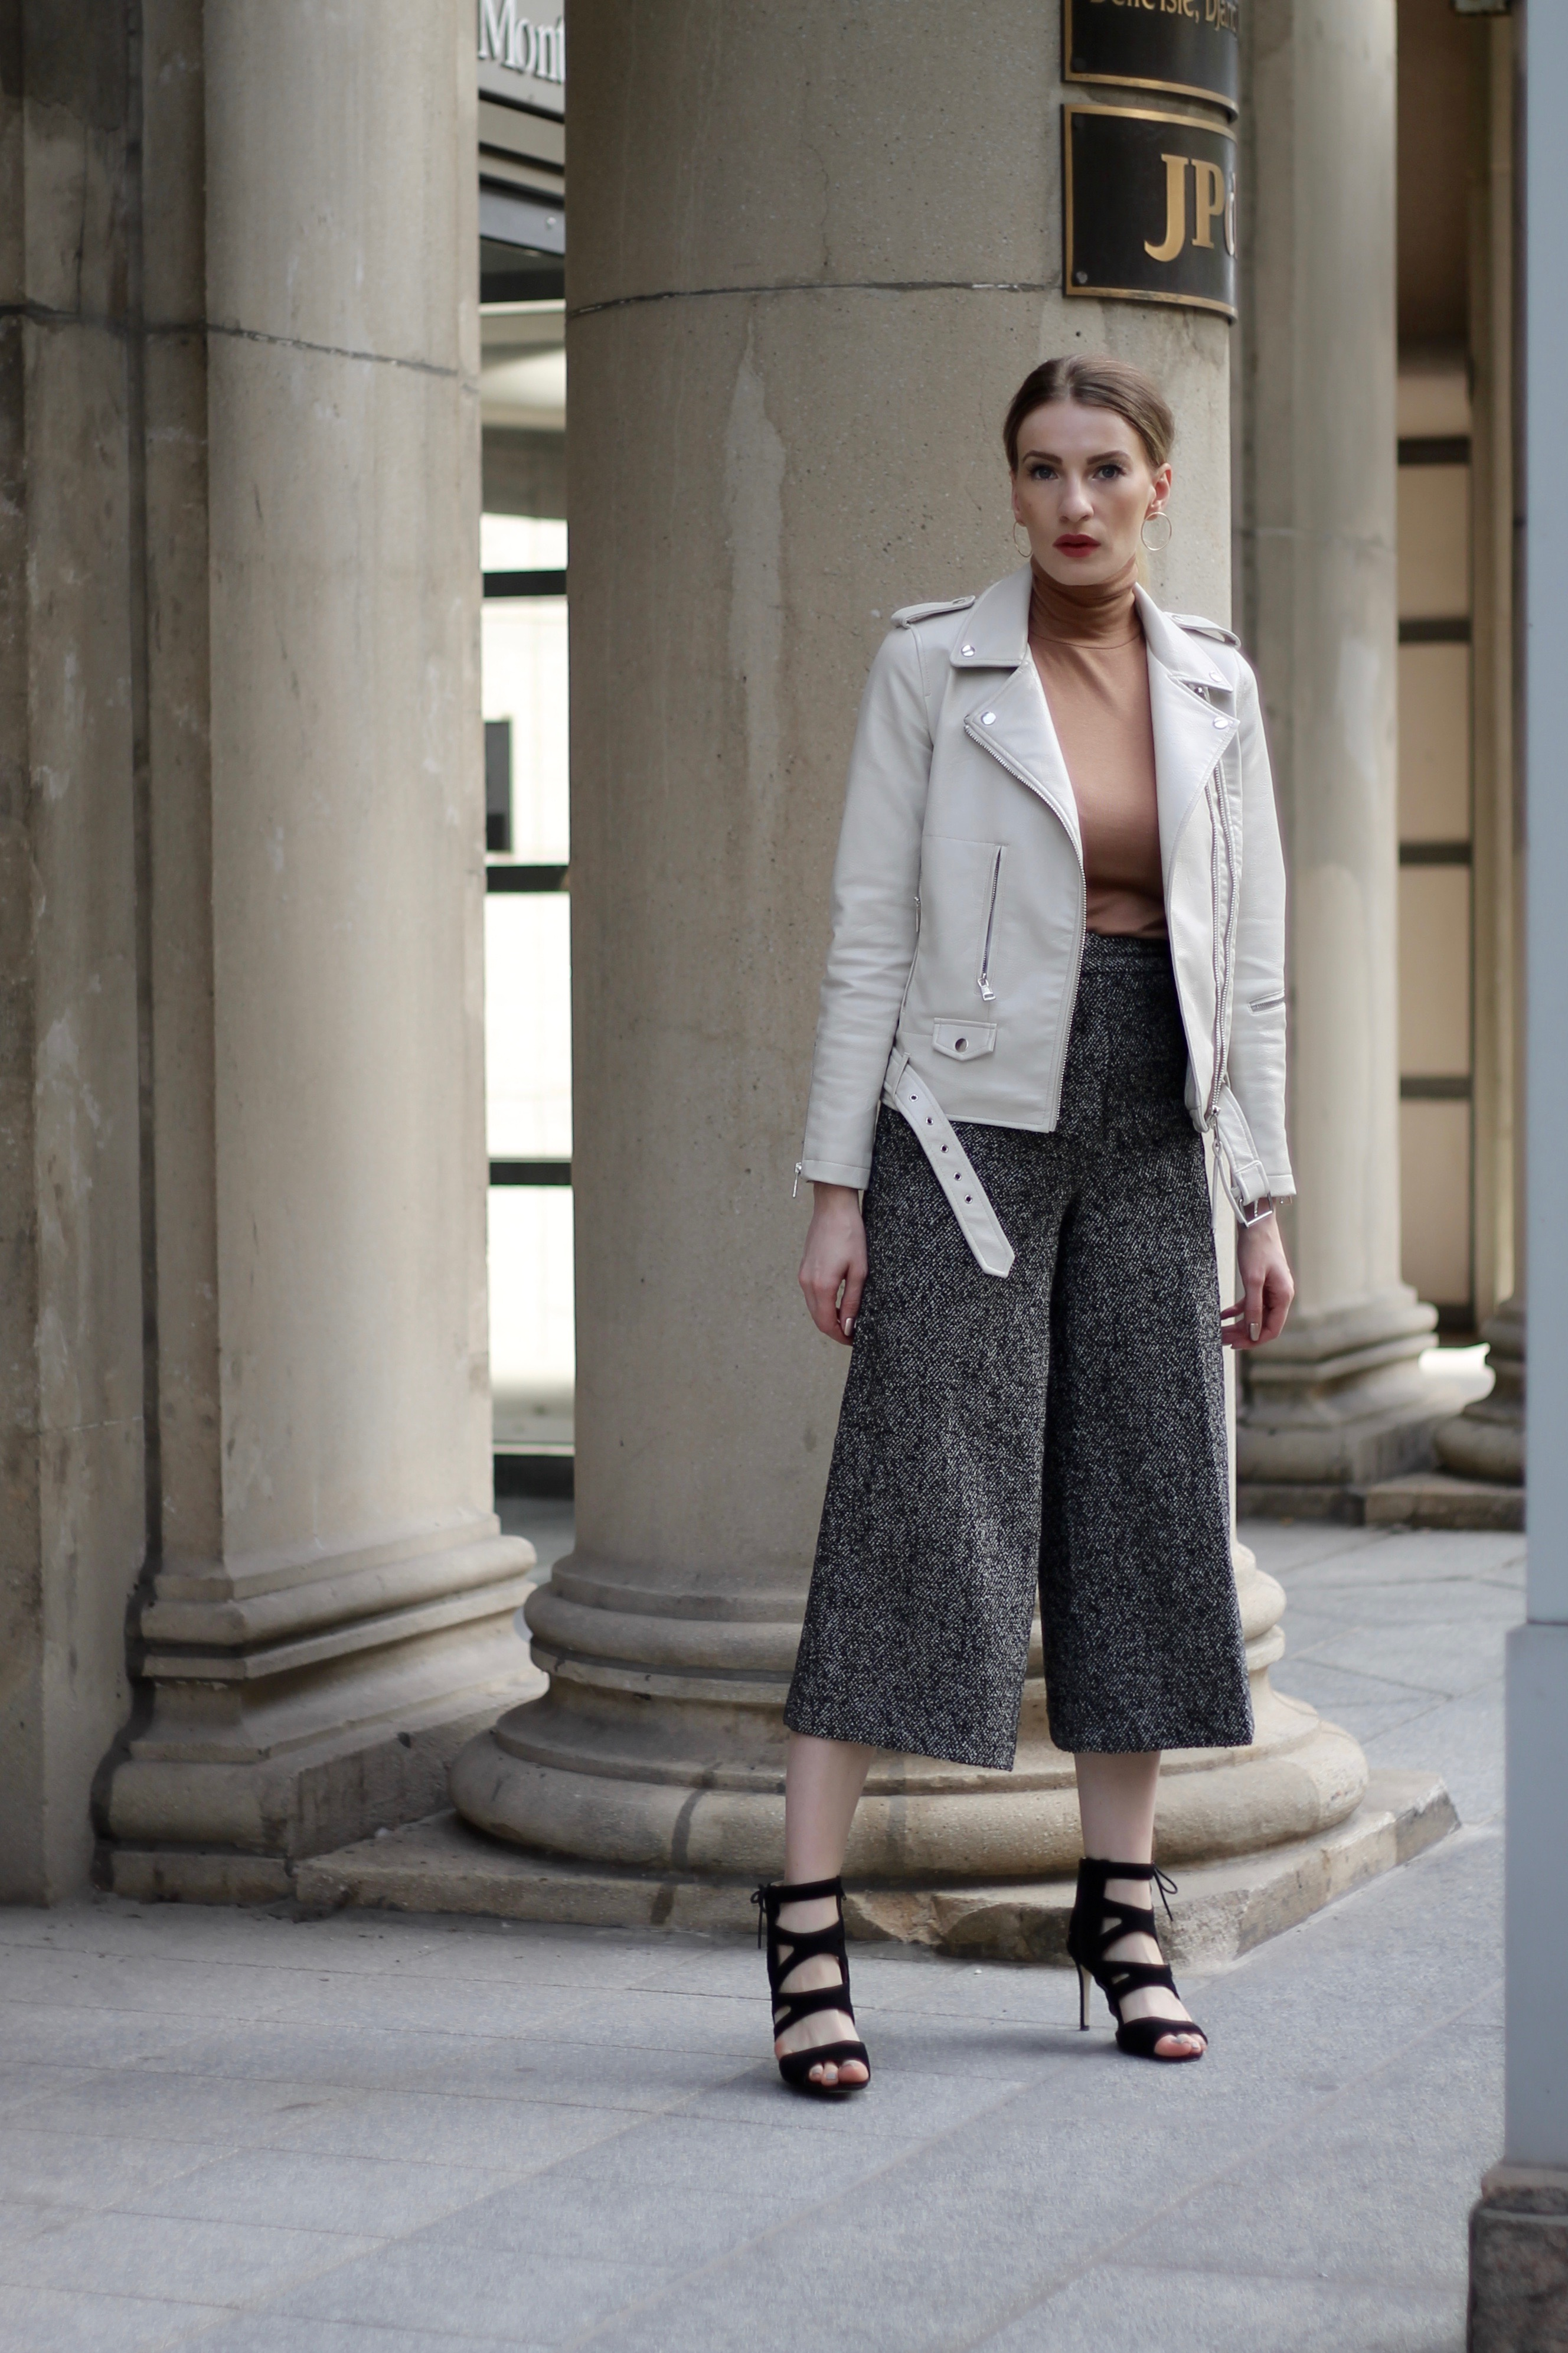 MON MODE Blog   Mon Mode   Style Blog   Toronto Blogger   Fall Wardrobe Staples   Massimo Dutti   Montreal